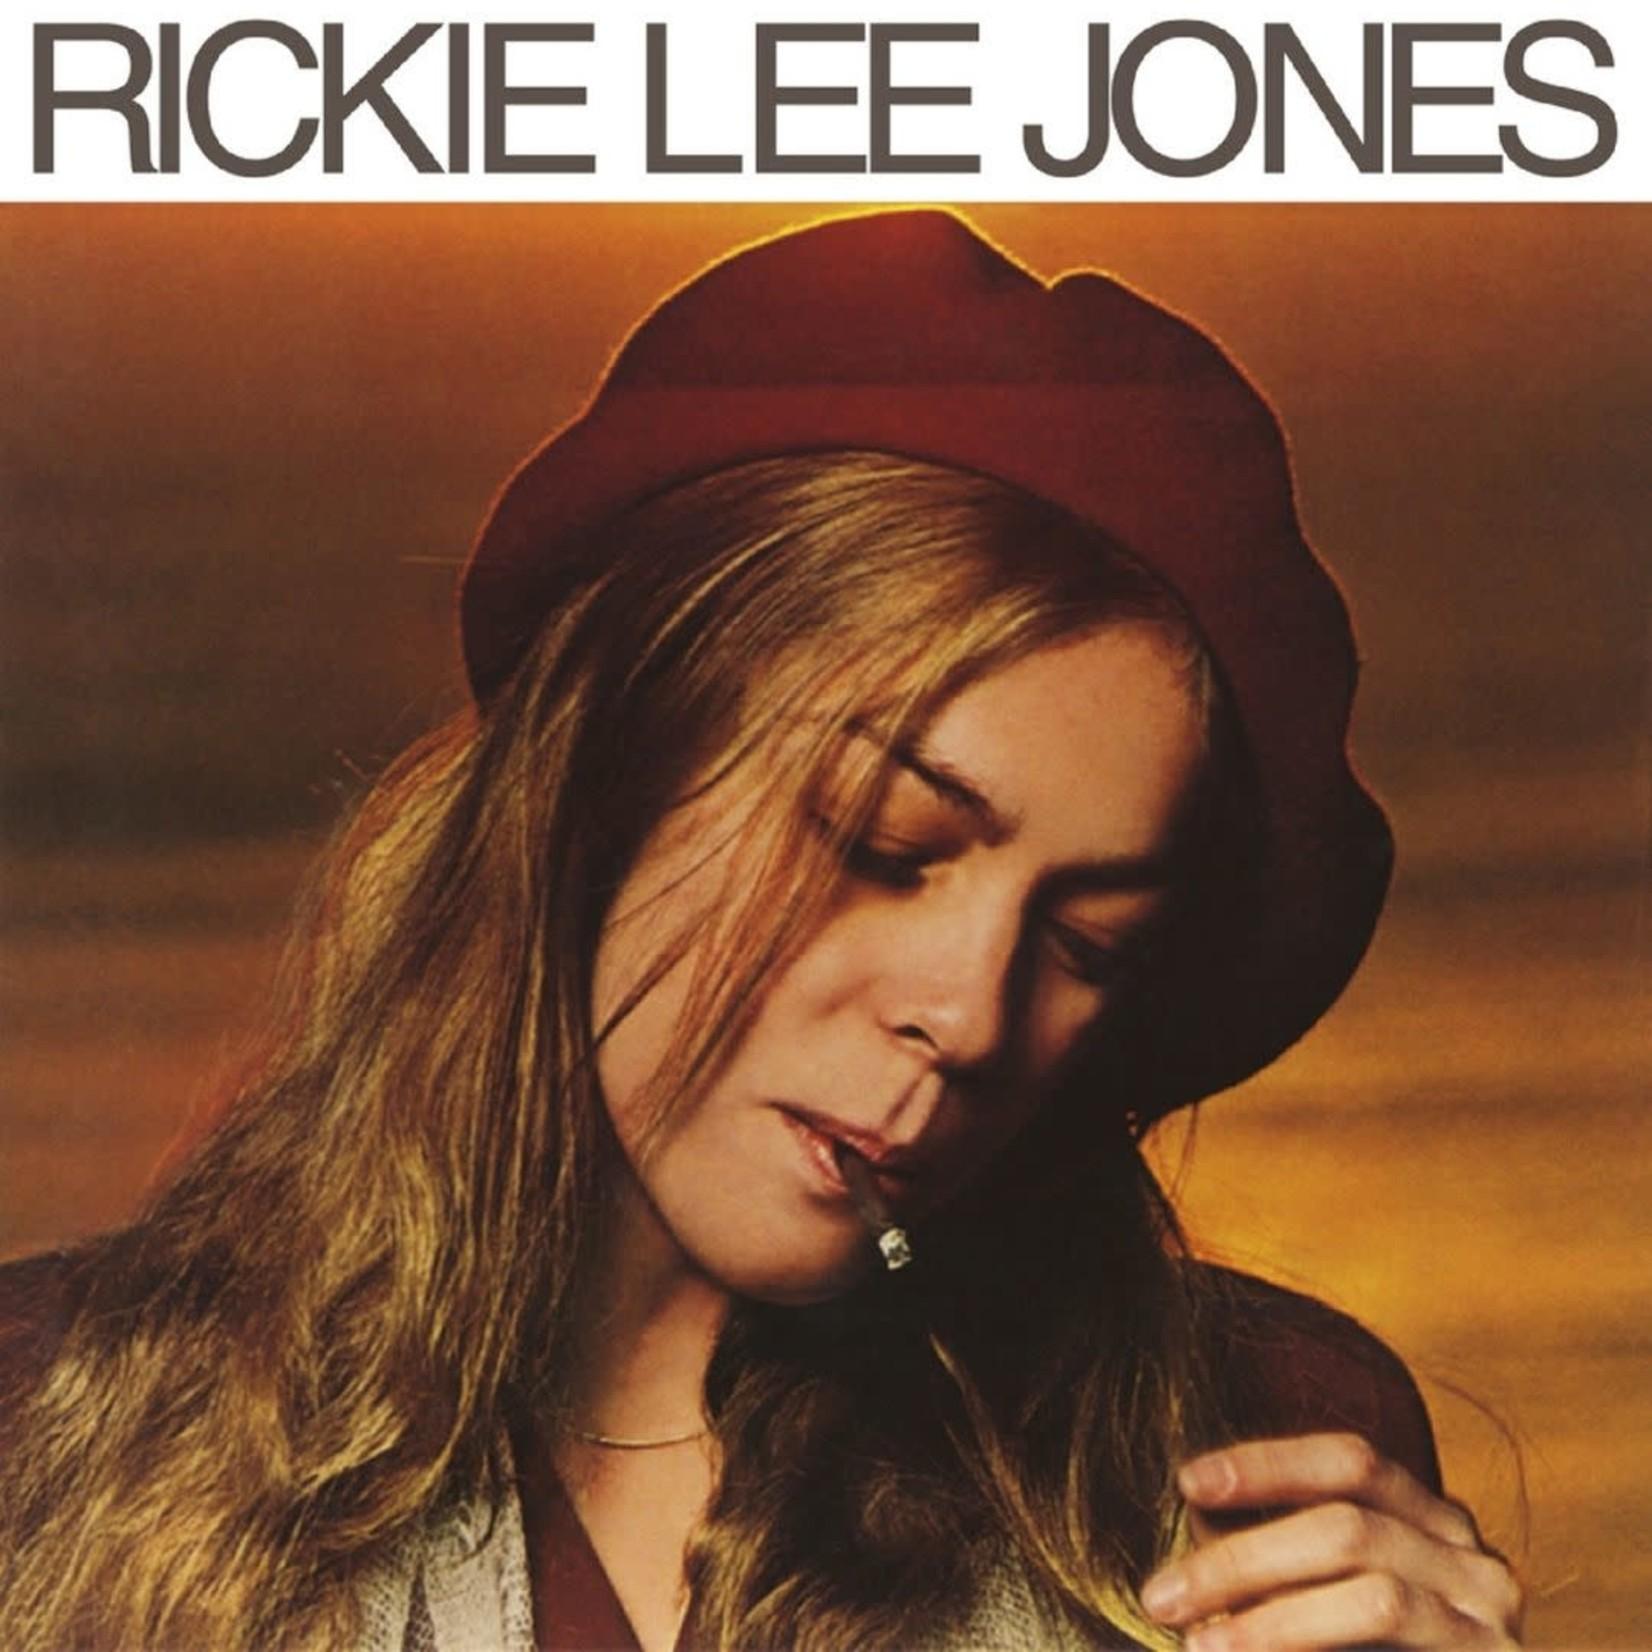 [Vintage] Jones, Rickie Lee: self-titled